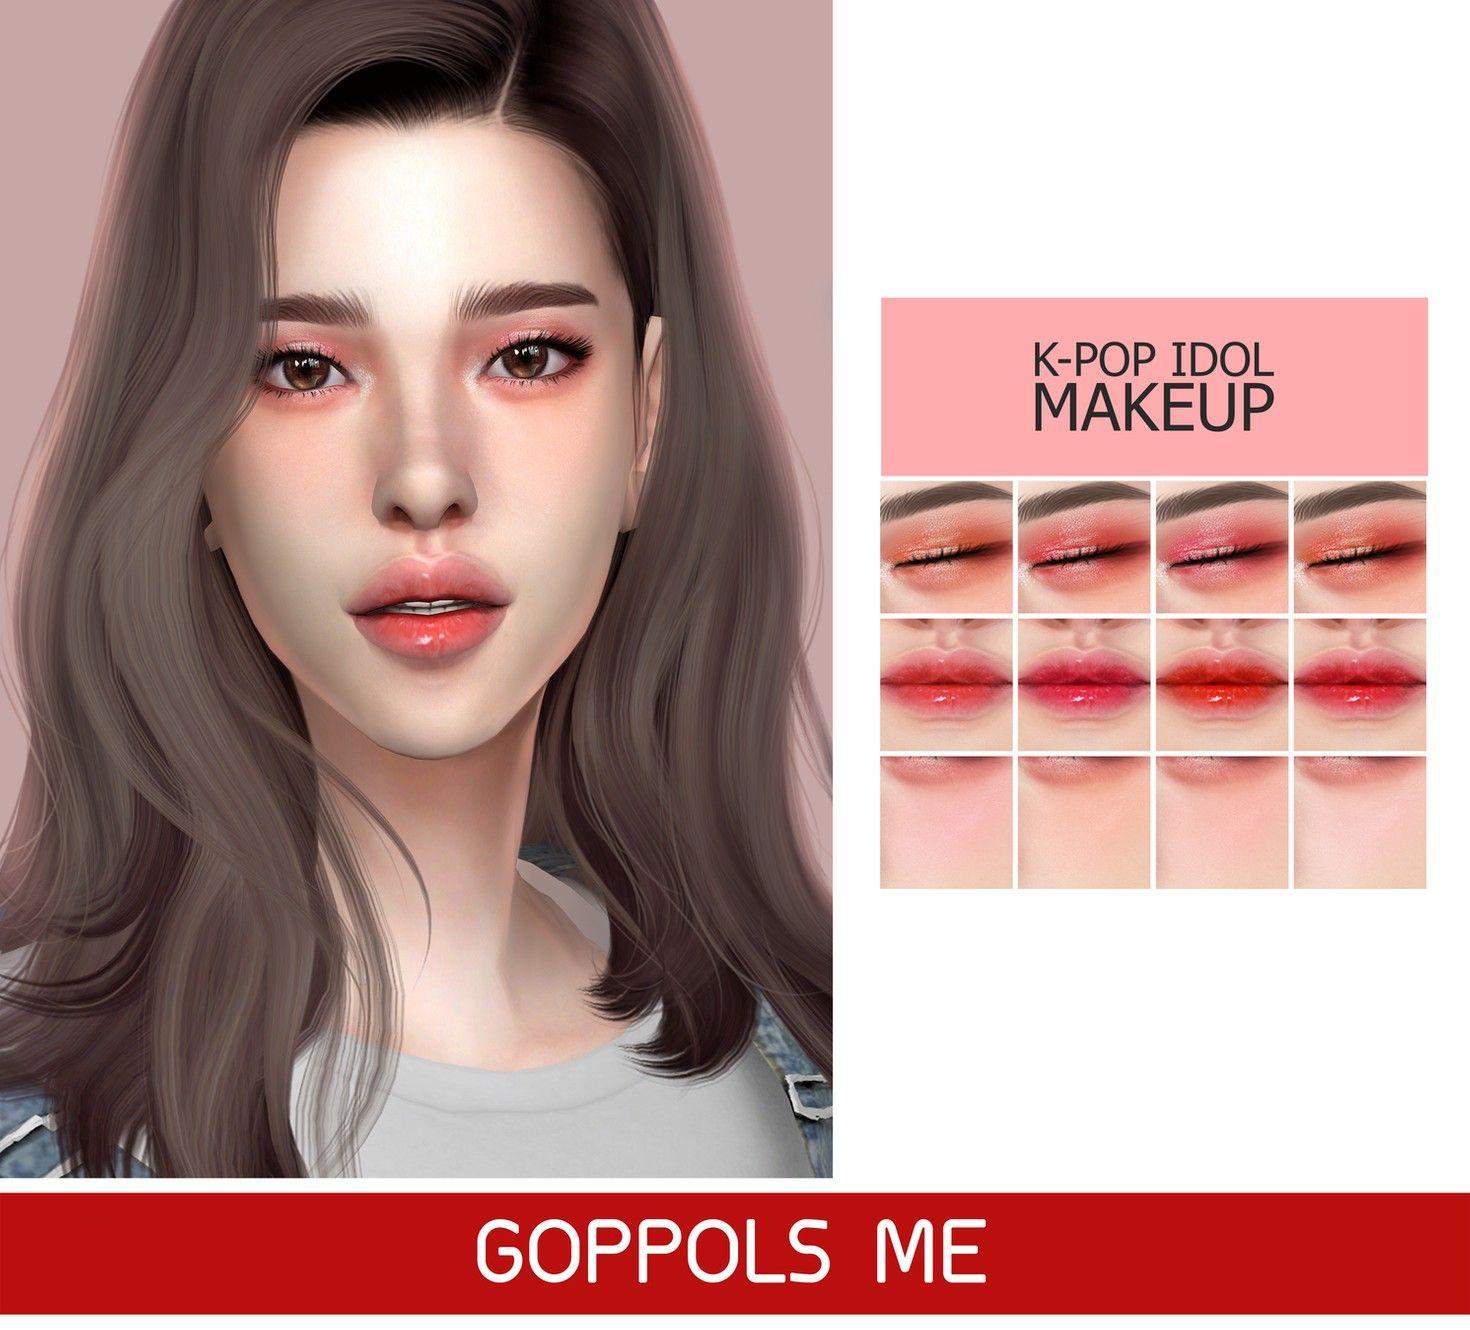 Gpme Kpop Idol Makeup Sims 4 Anime Sims 4 The Sims 4 Skin